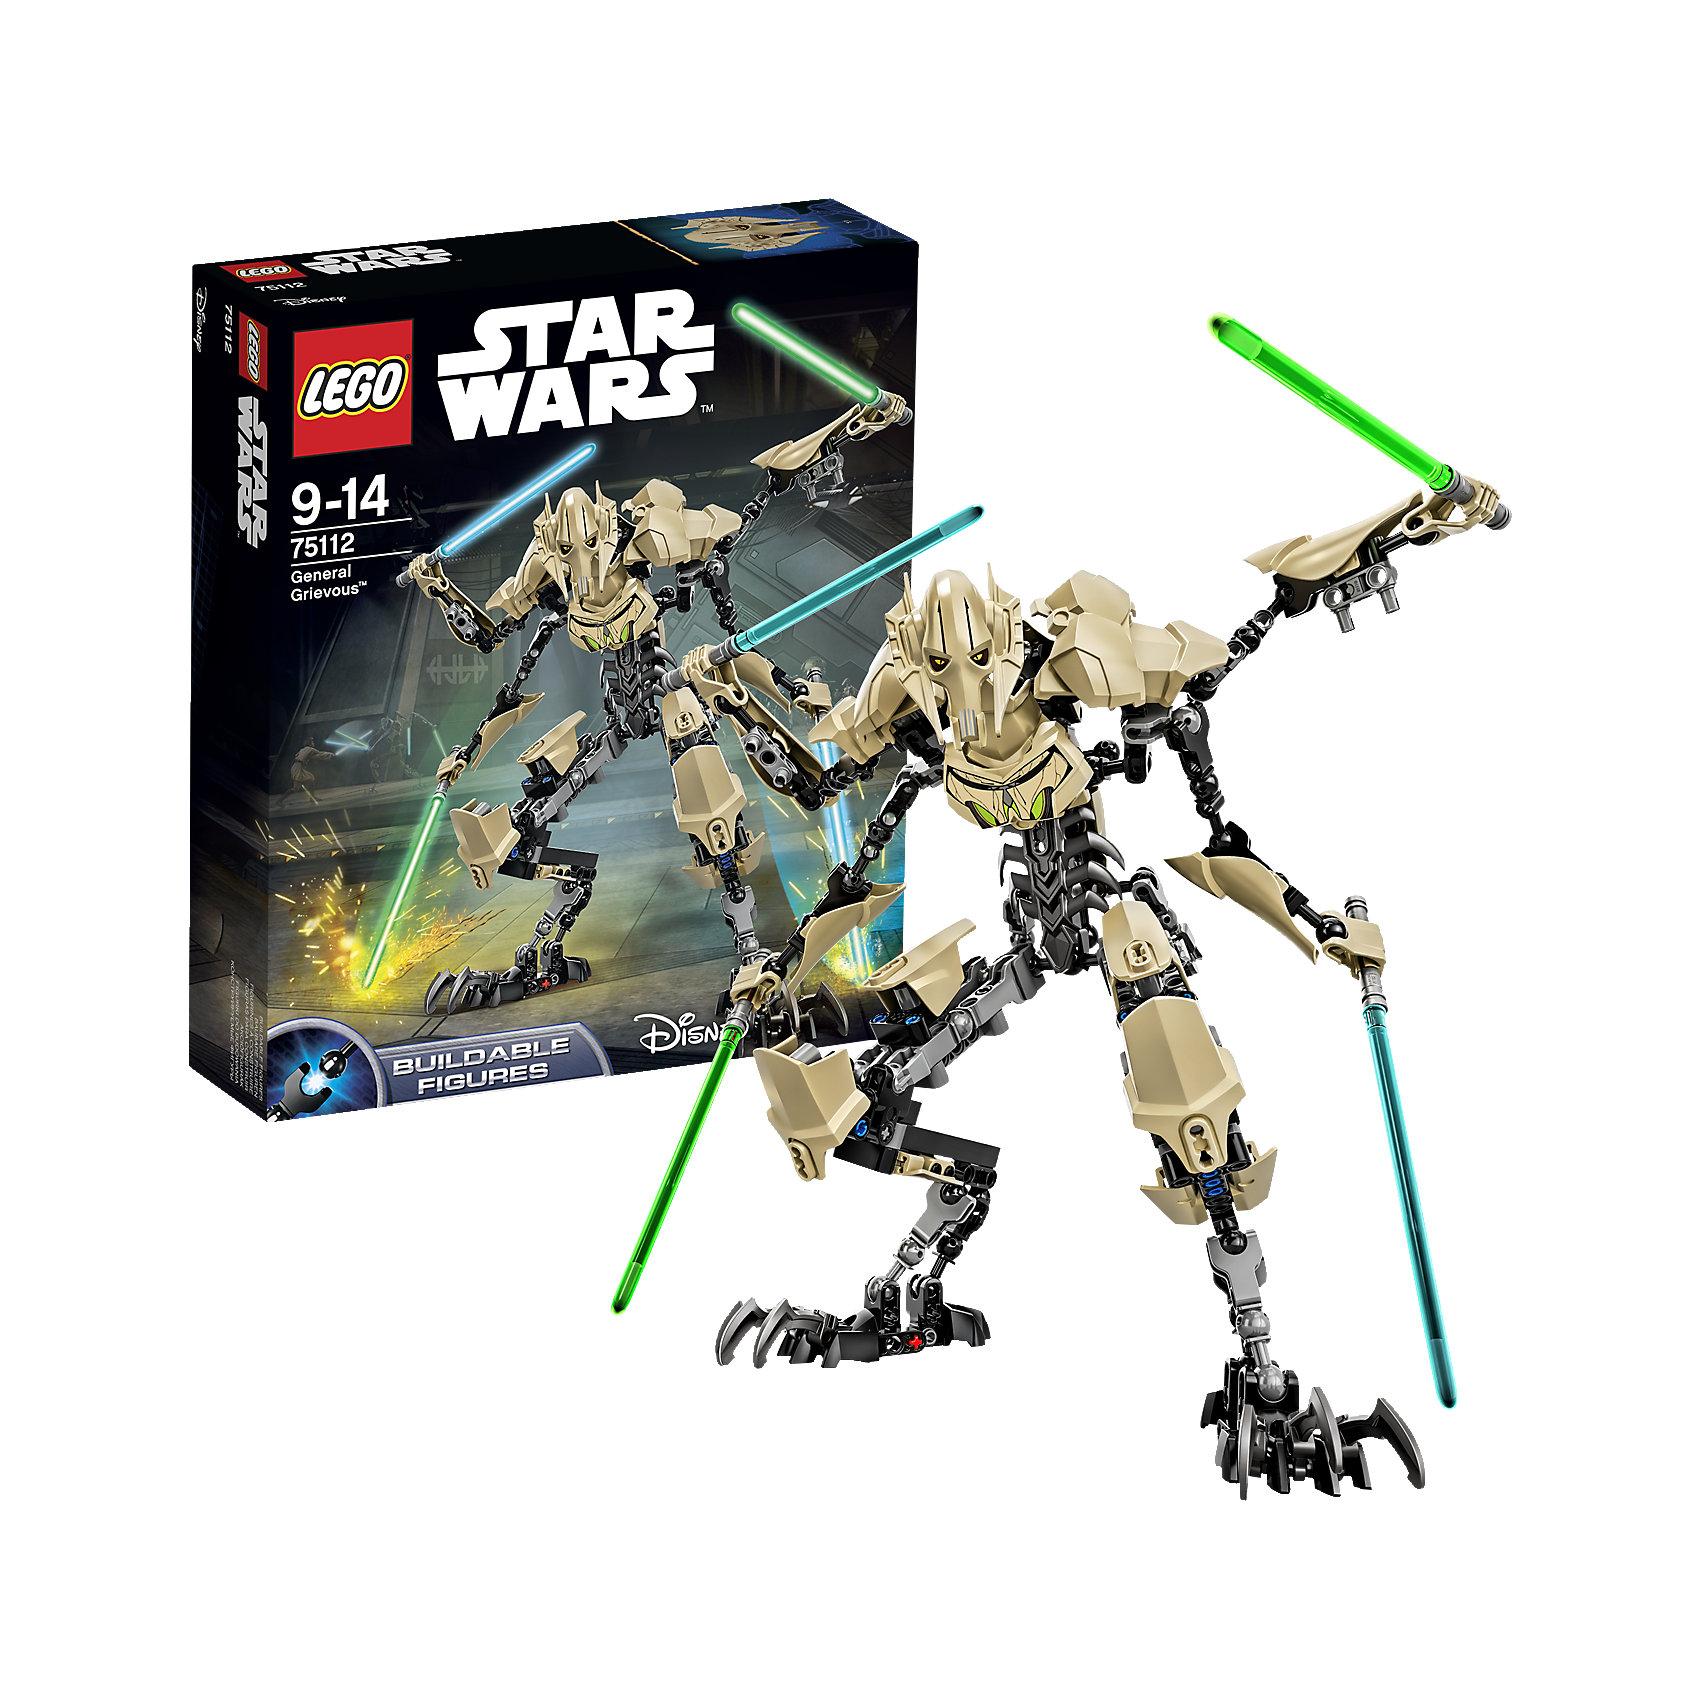 LEGO LEGO Star Wars 75112: Генерал Гривус produino 5v voltage boost mobile power module green 1a